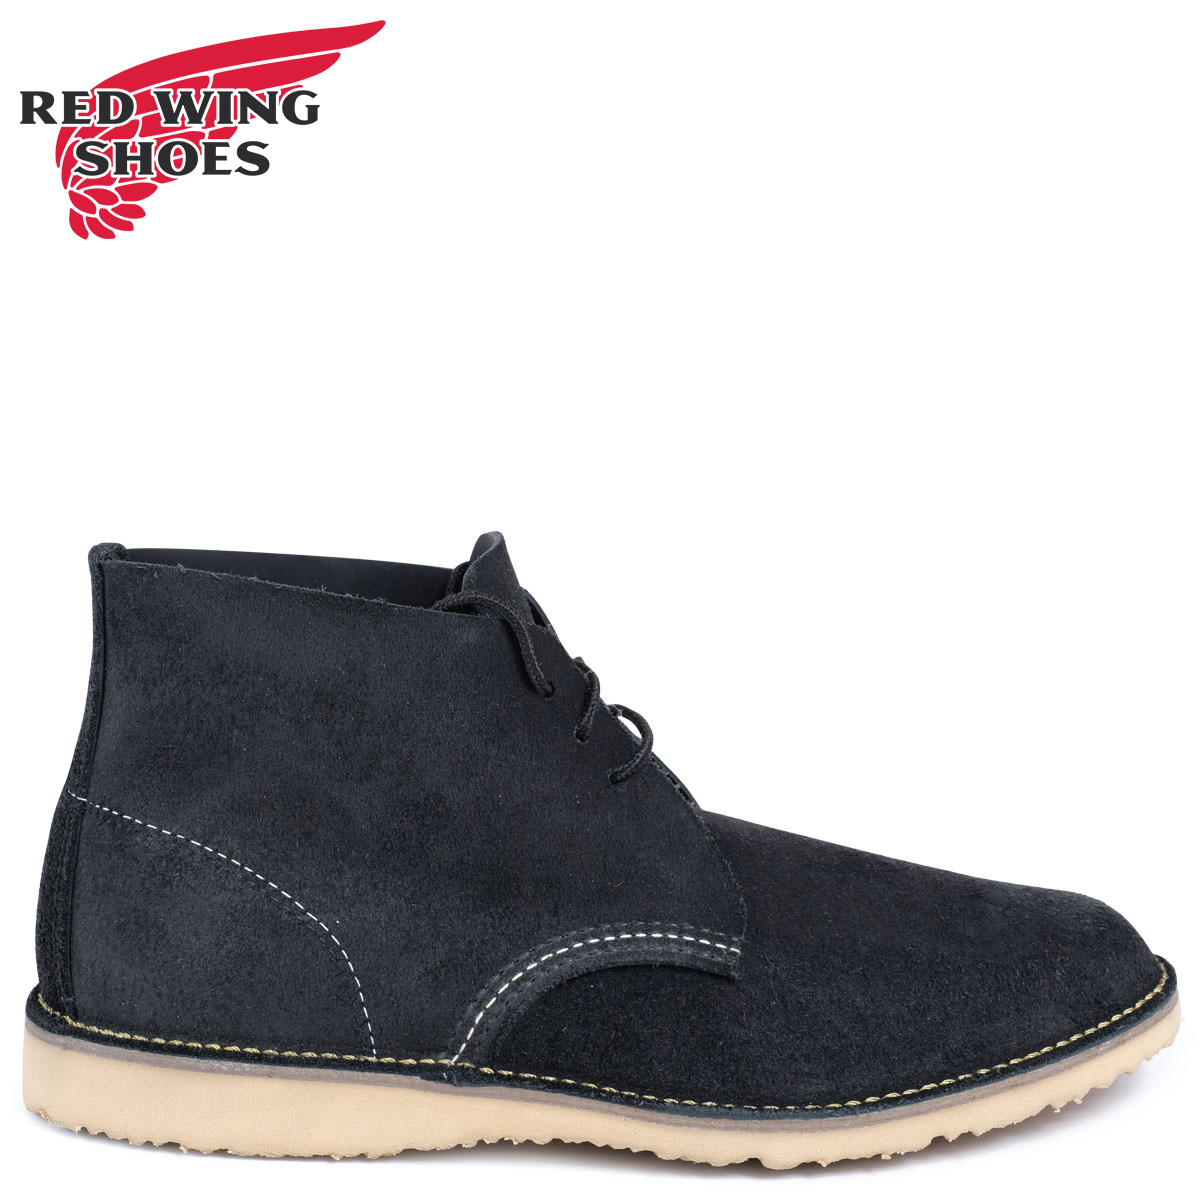 RED WING レッドウィング ブーツ チャッカ WEEKENDER CHUKKA Dワイズ 3323 レッドウイング メンズ ブラック